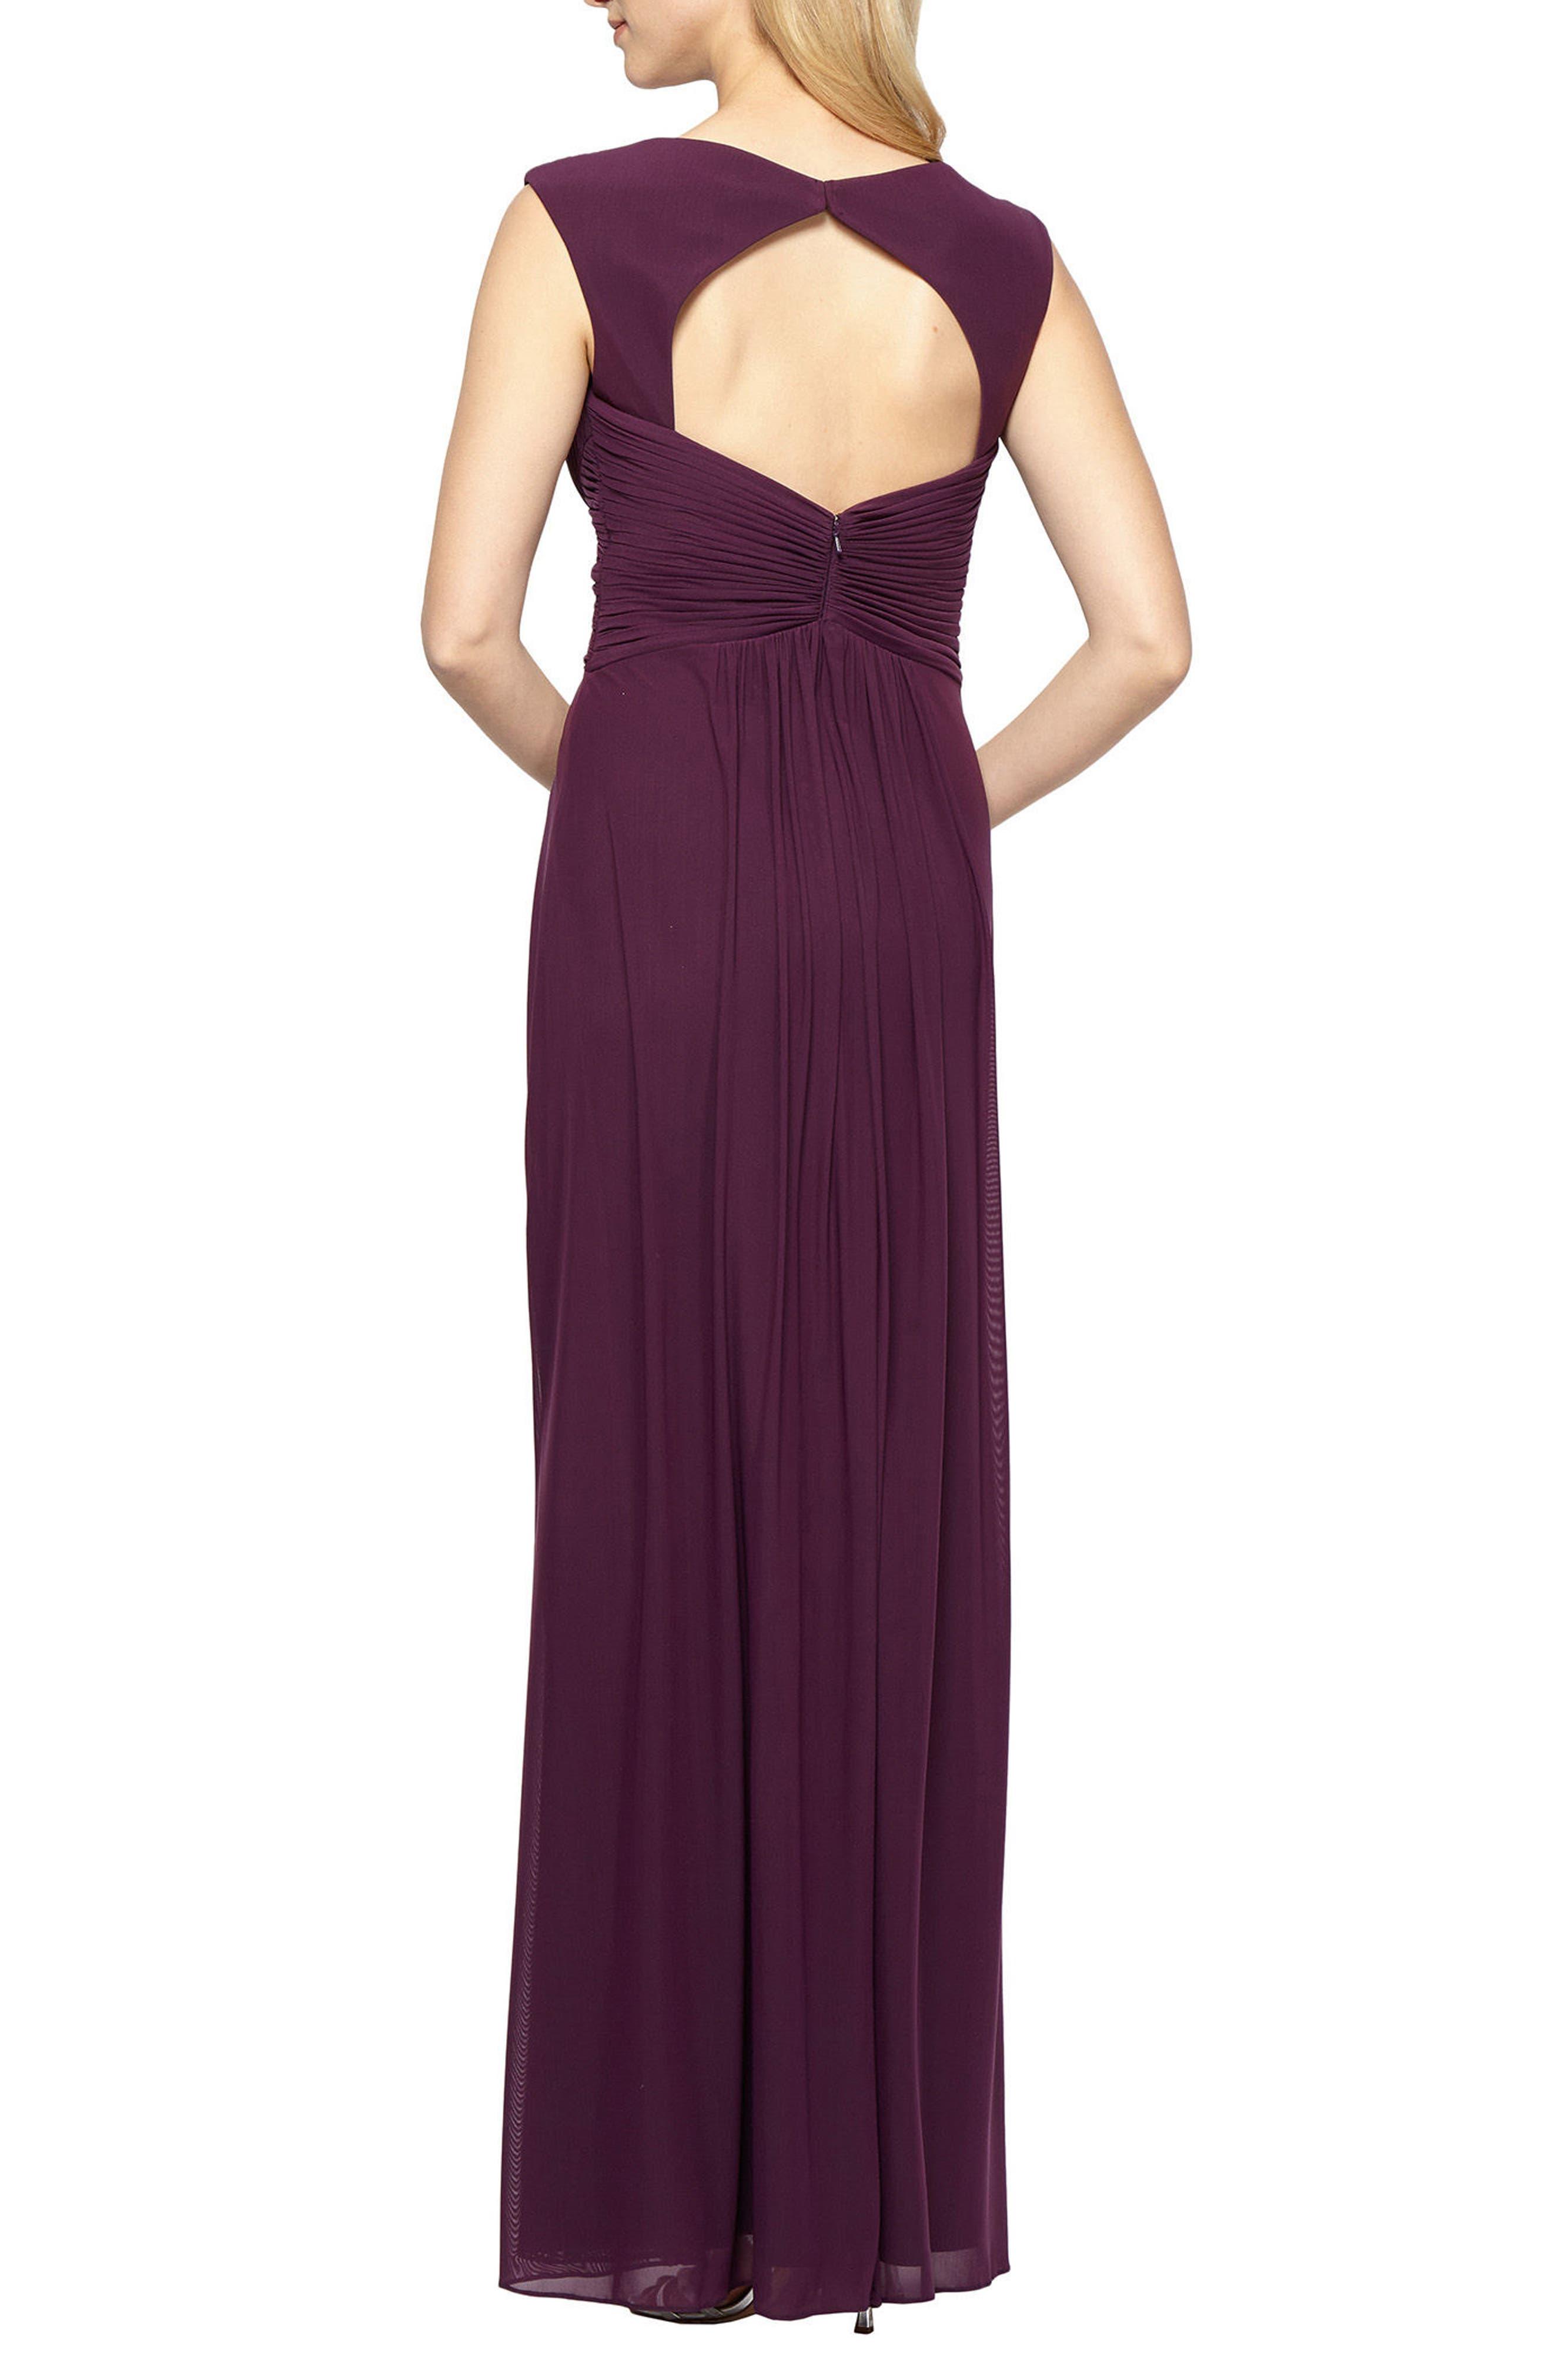 A-Line Gown,                             Alternate thumbnail 2, color,                             542